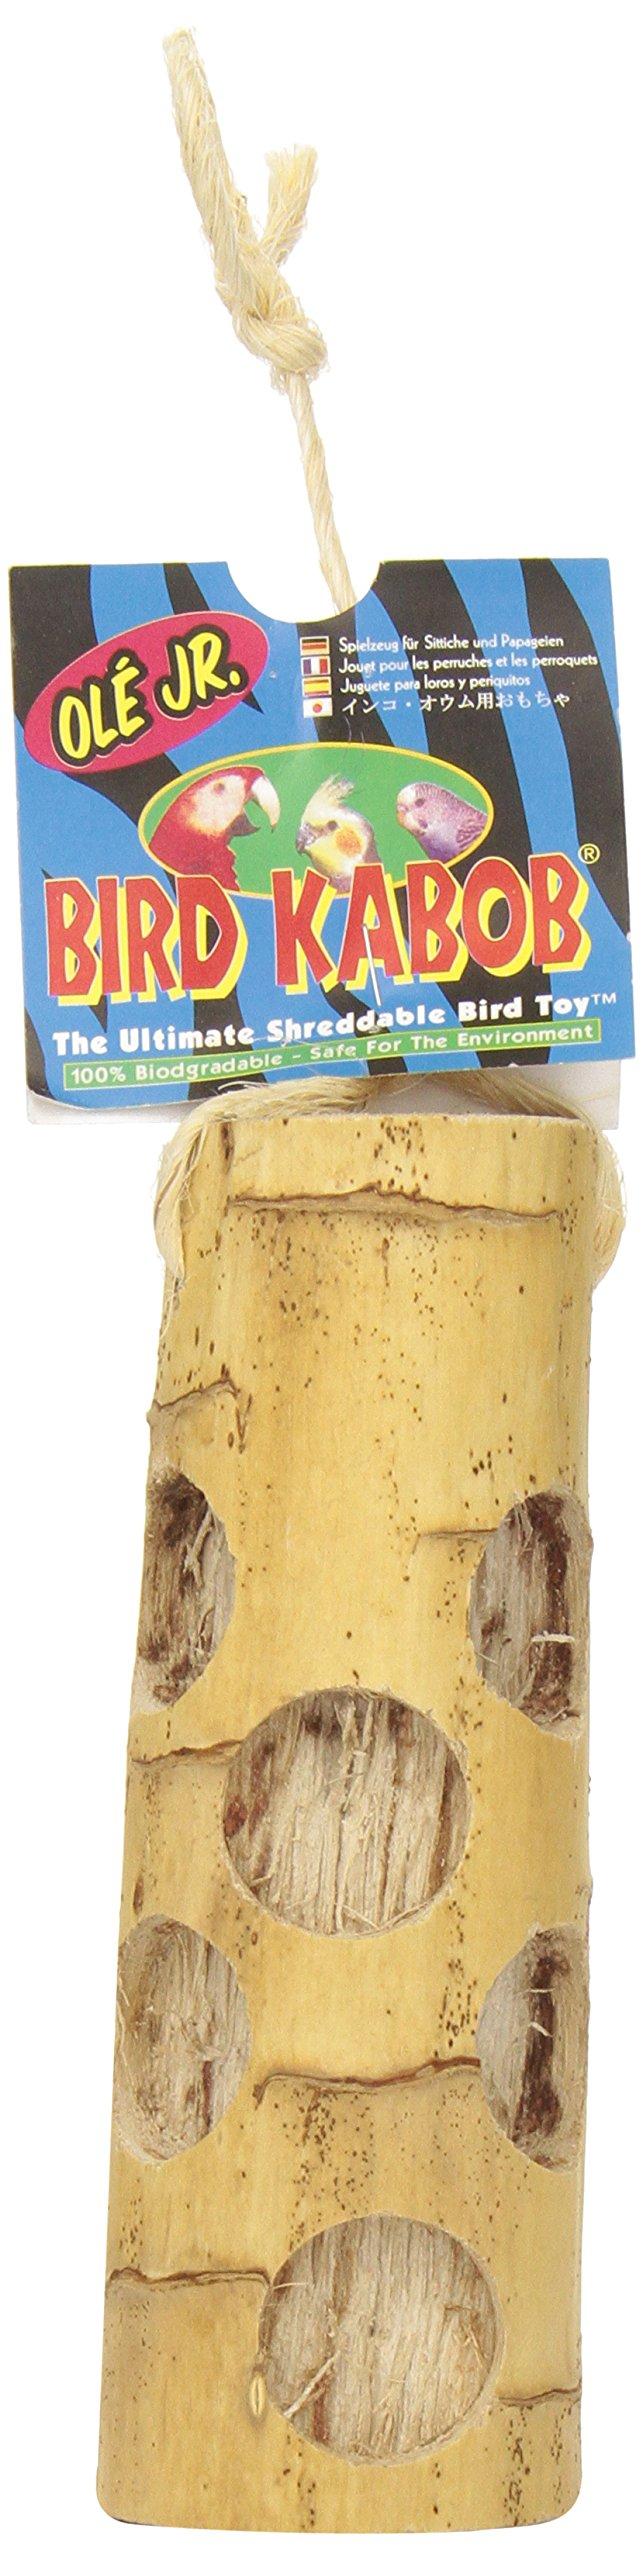 Wesco Ole Jr. Bird Kabob Toy, Small